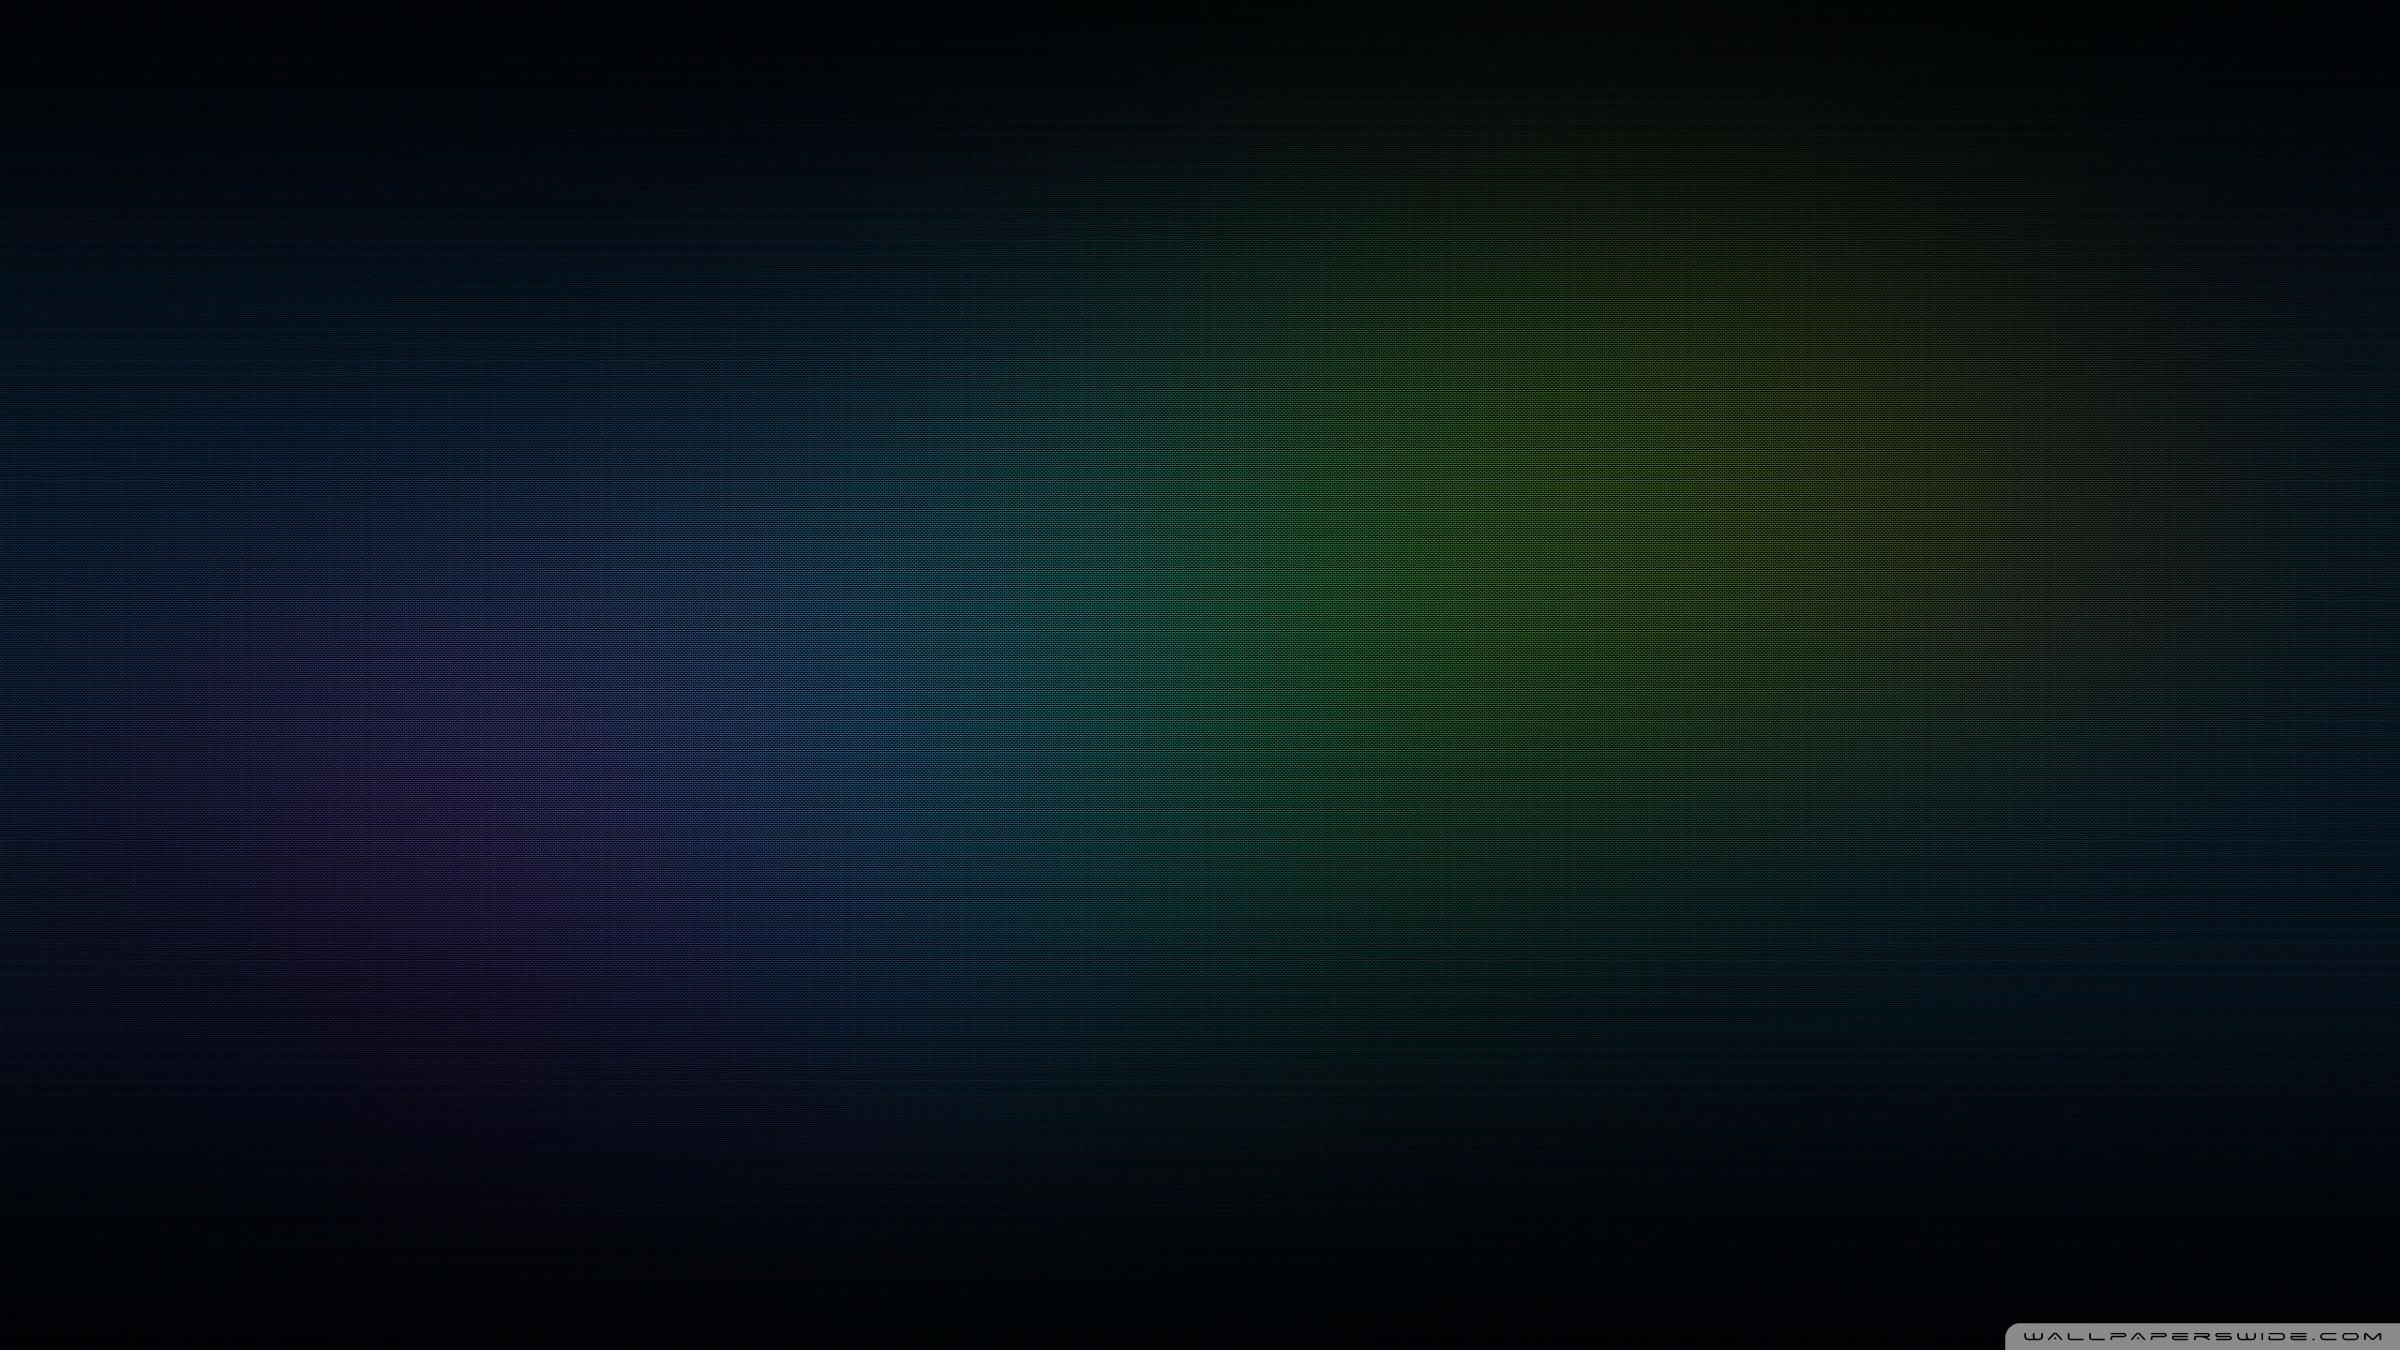 Dark Colors Background HD desktop wallpaper : High Definition